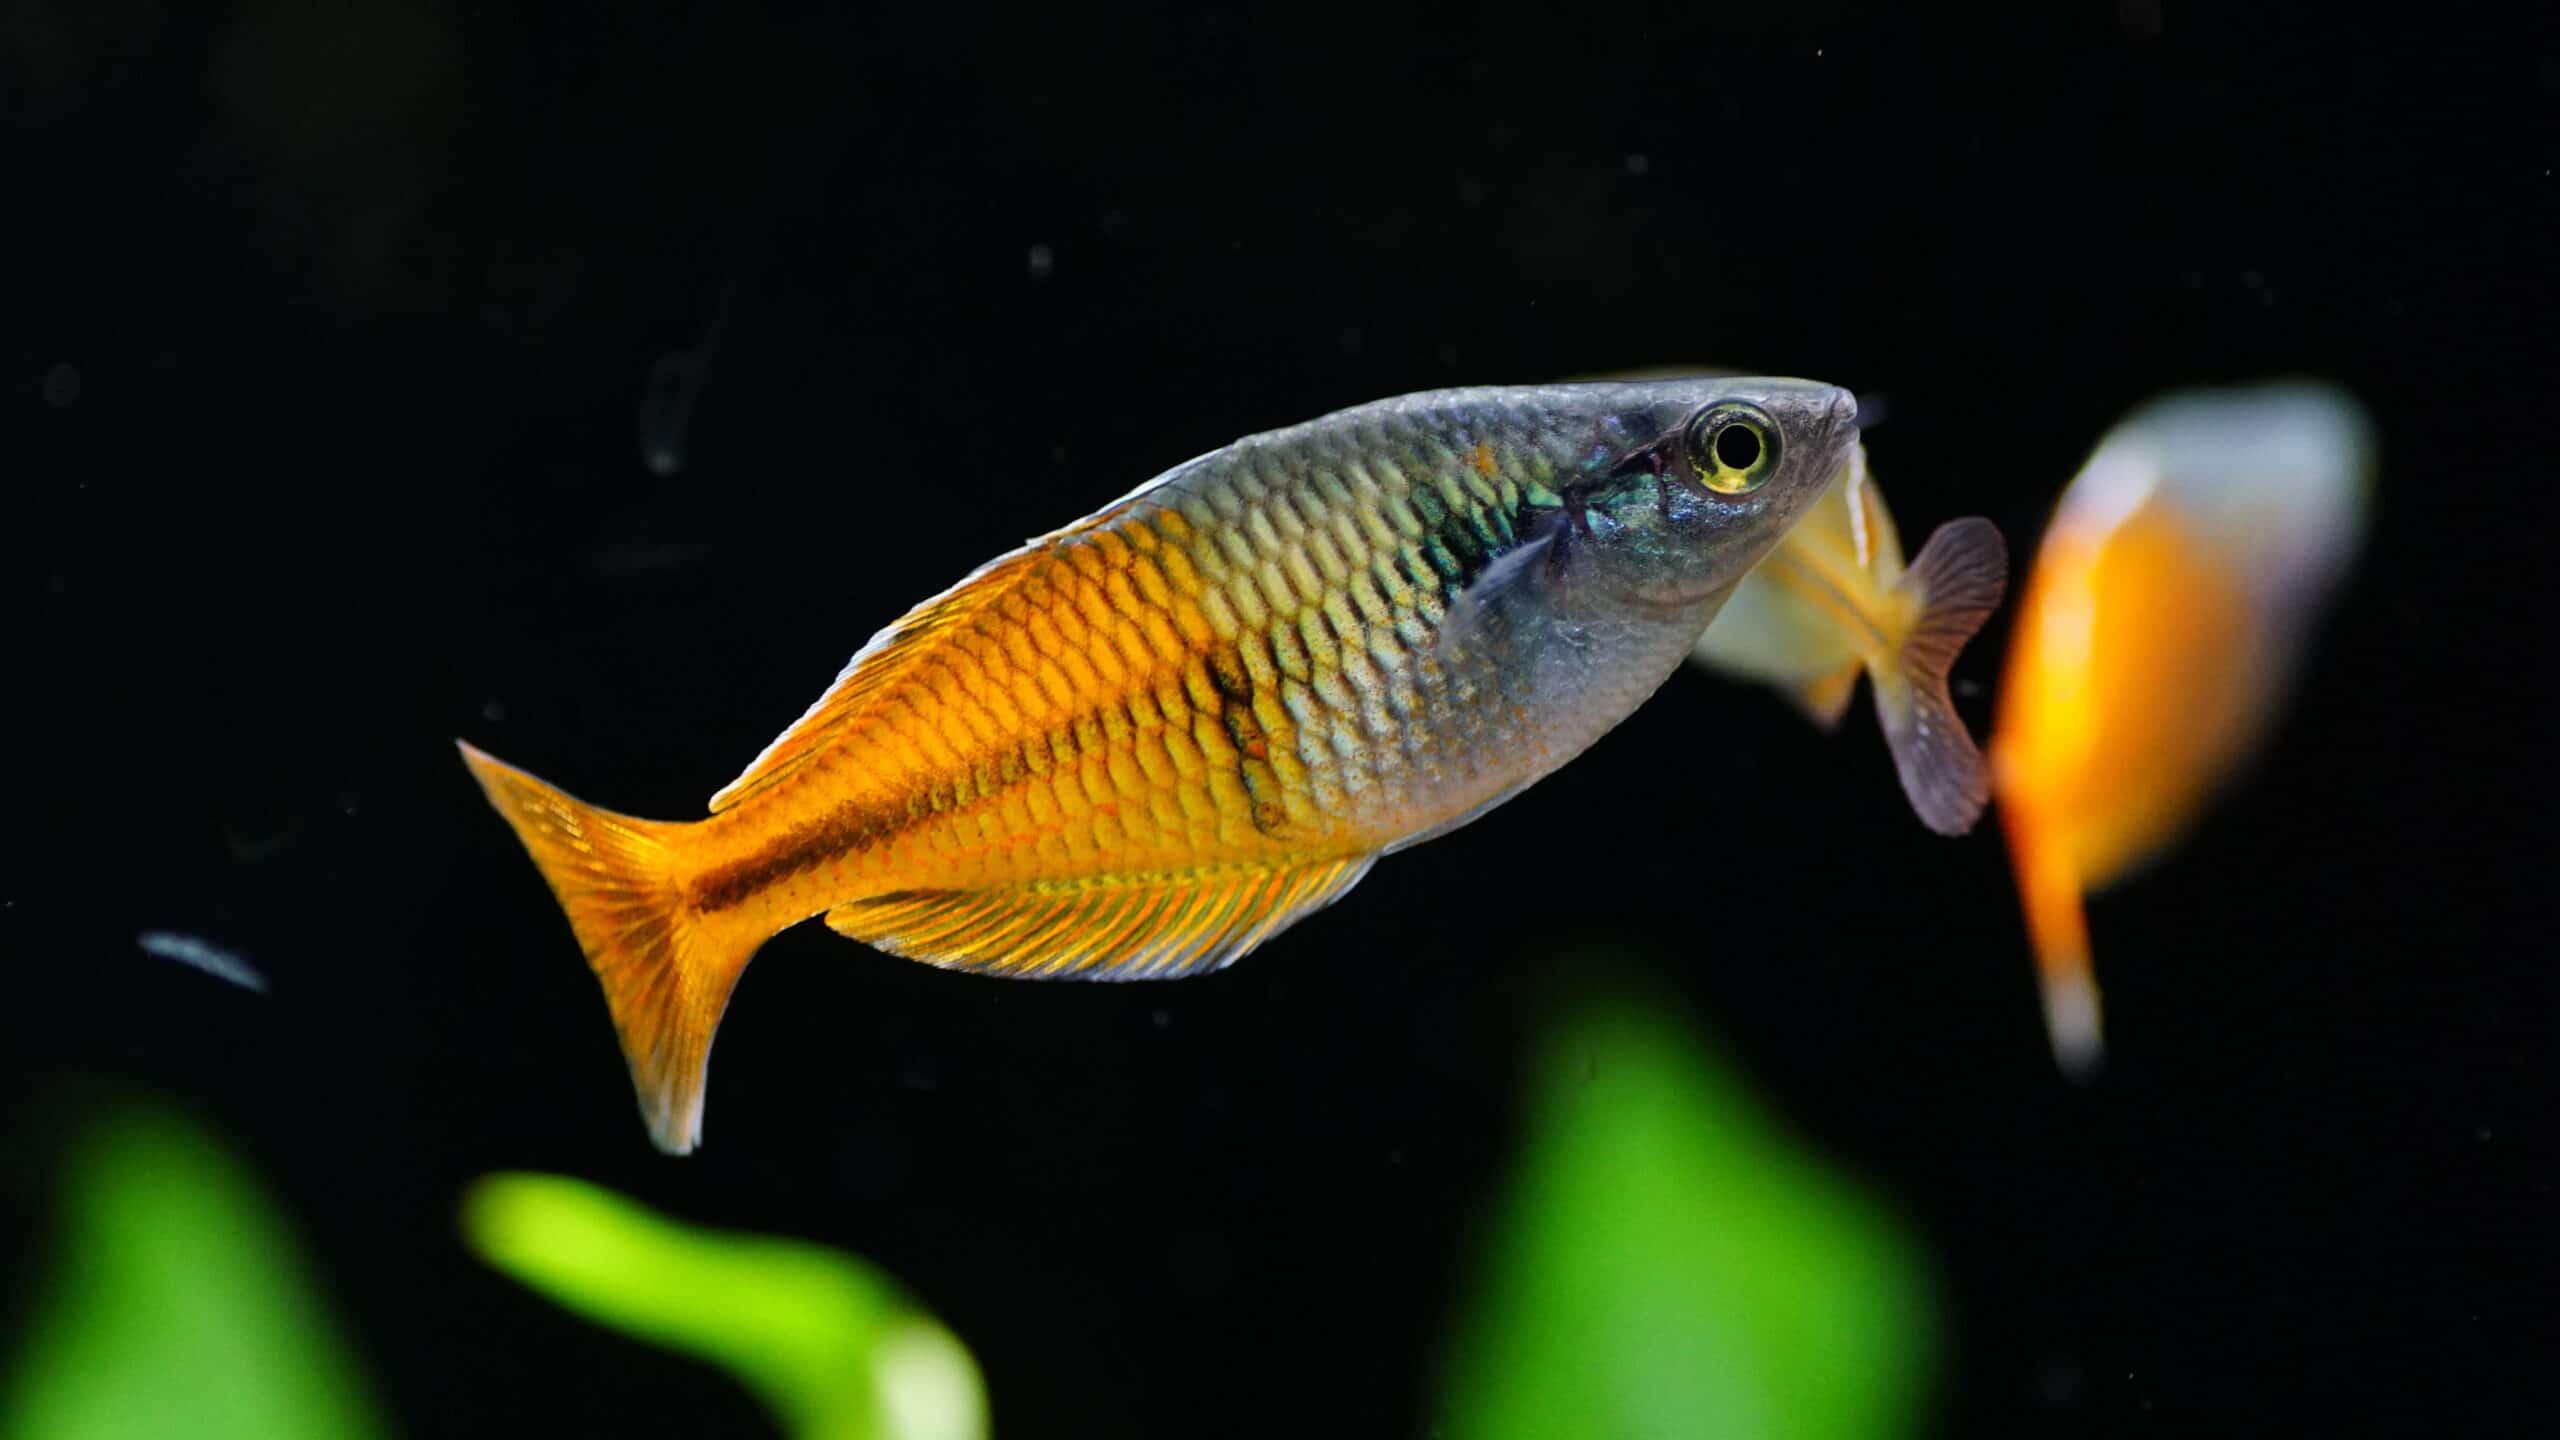 Regenbogen- & Ährenfische